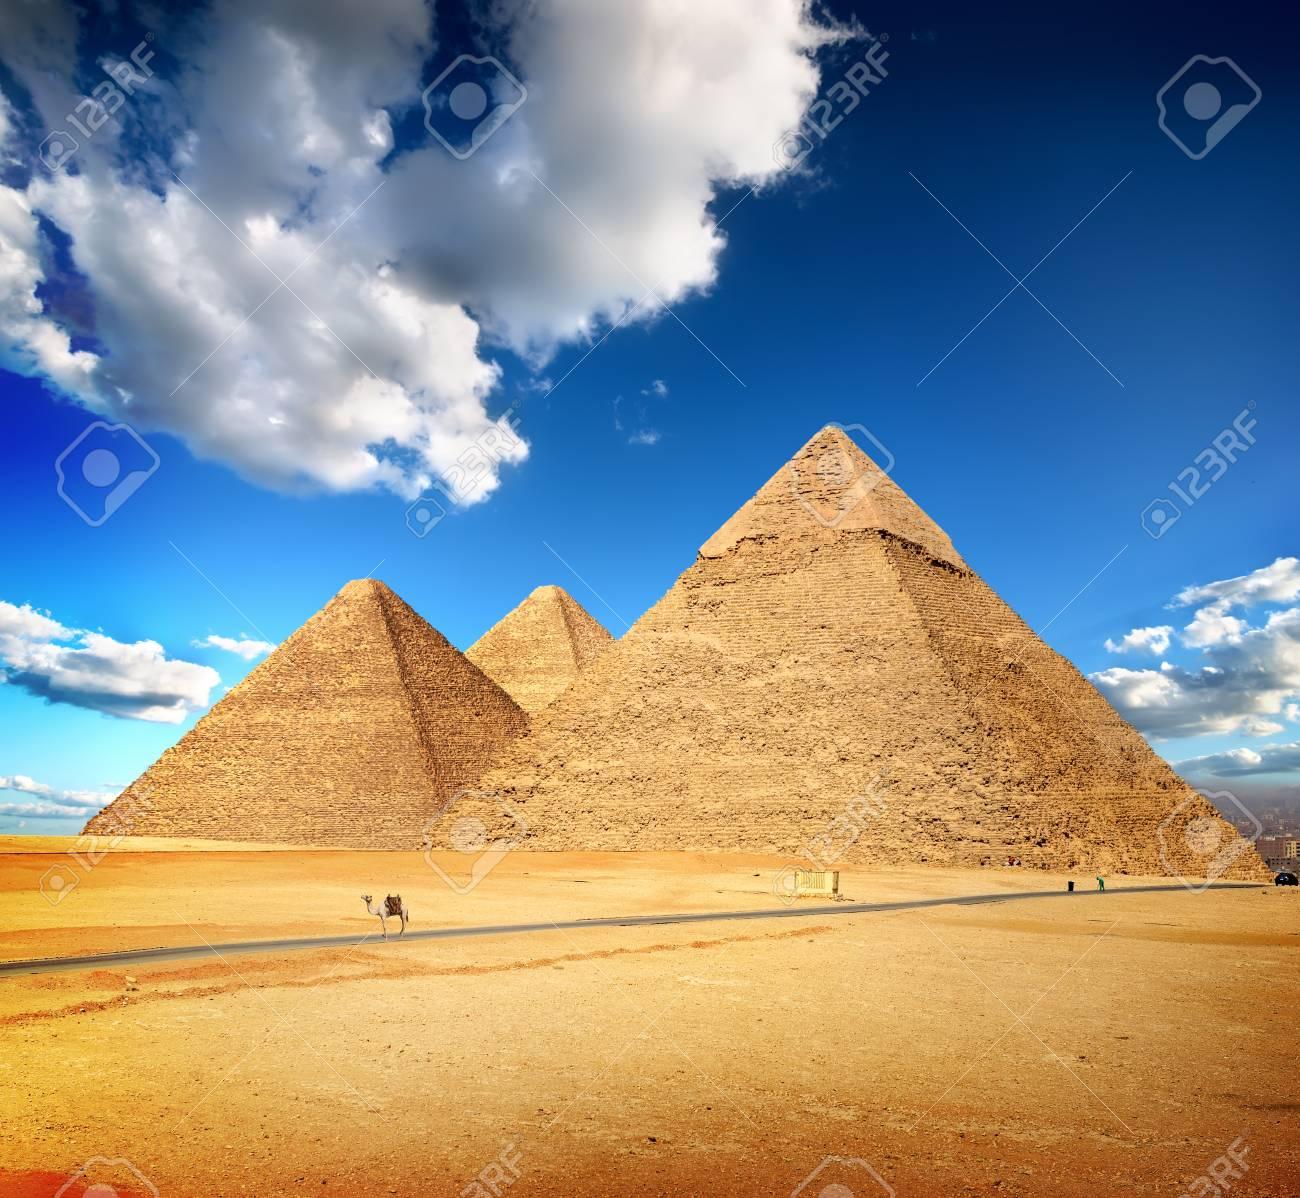 Pyramids of Giza - 93413089